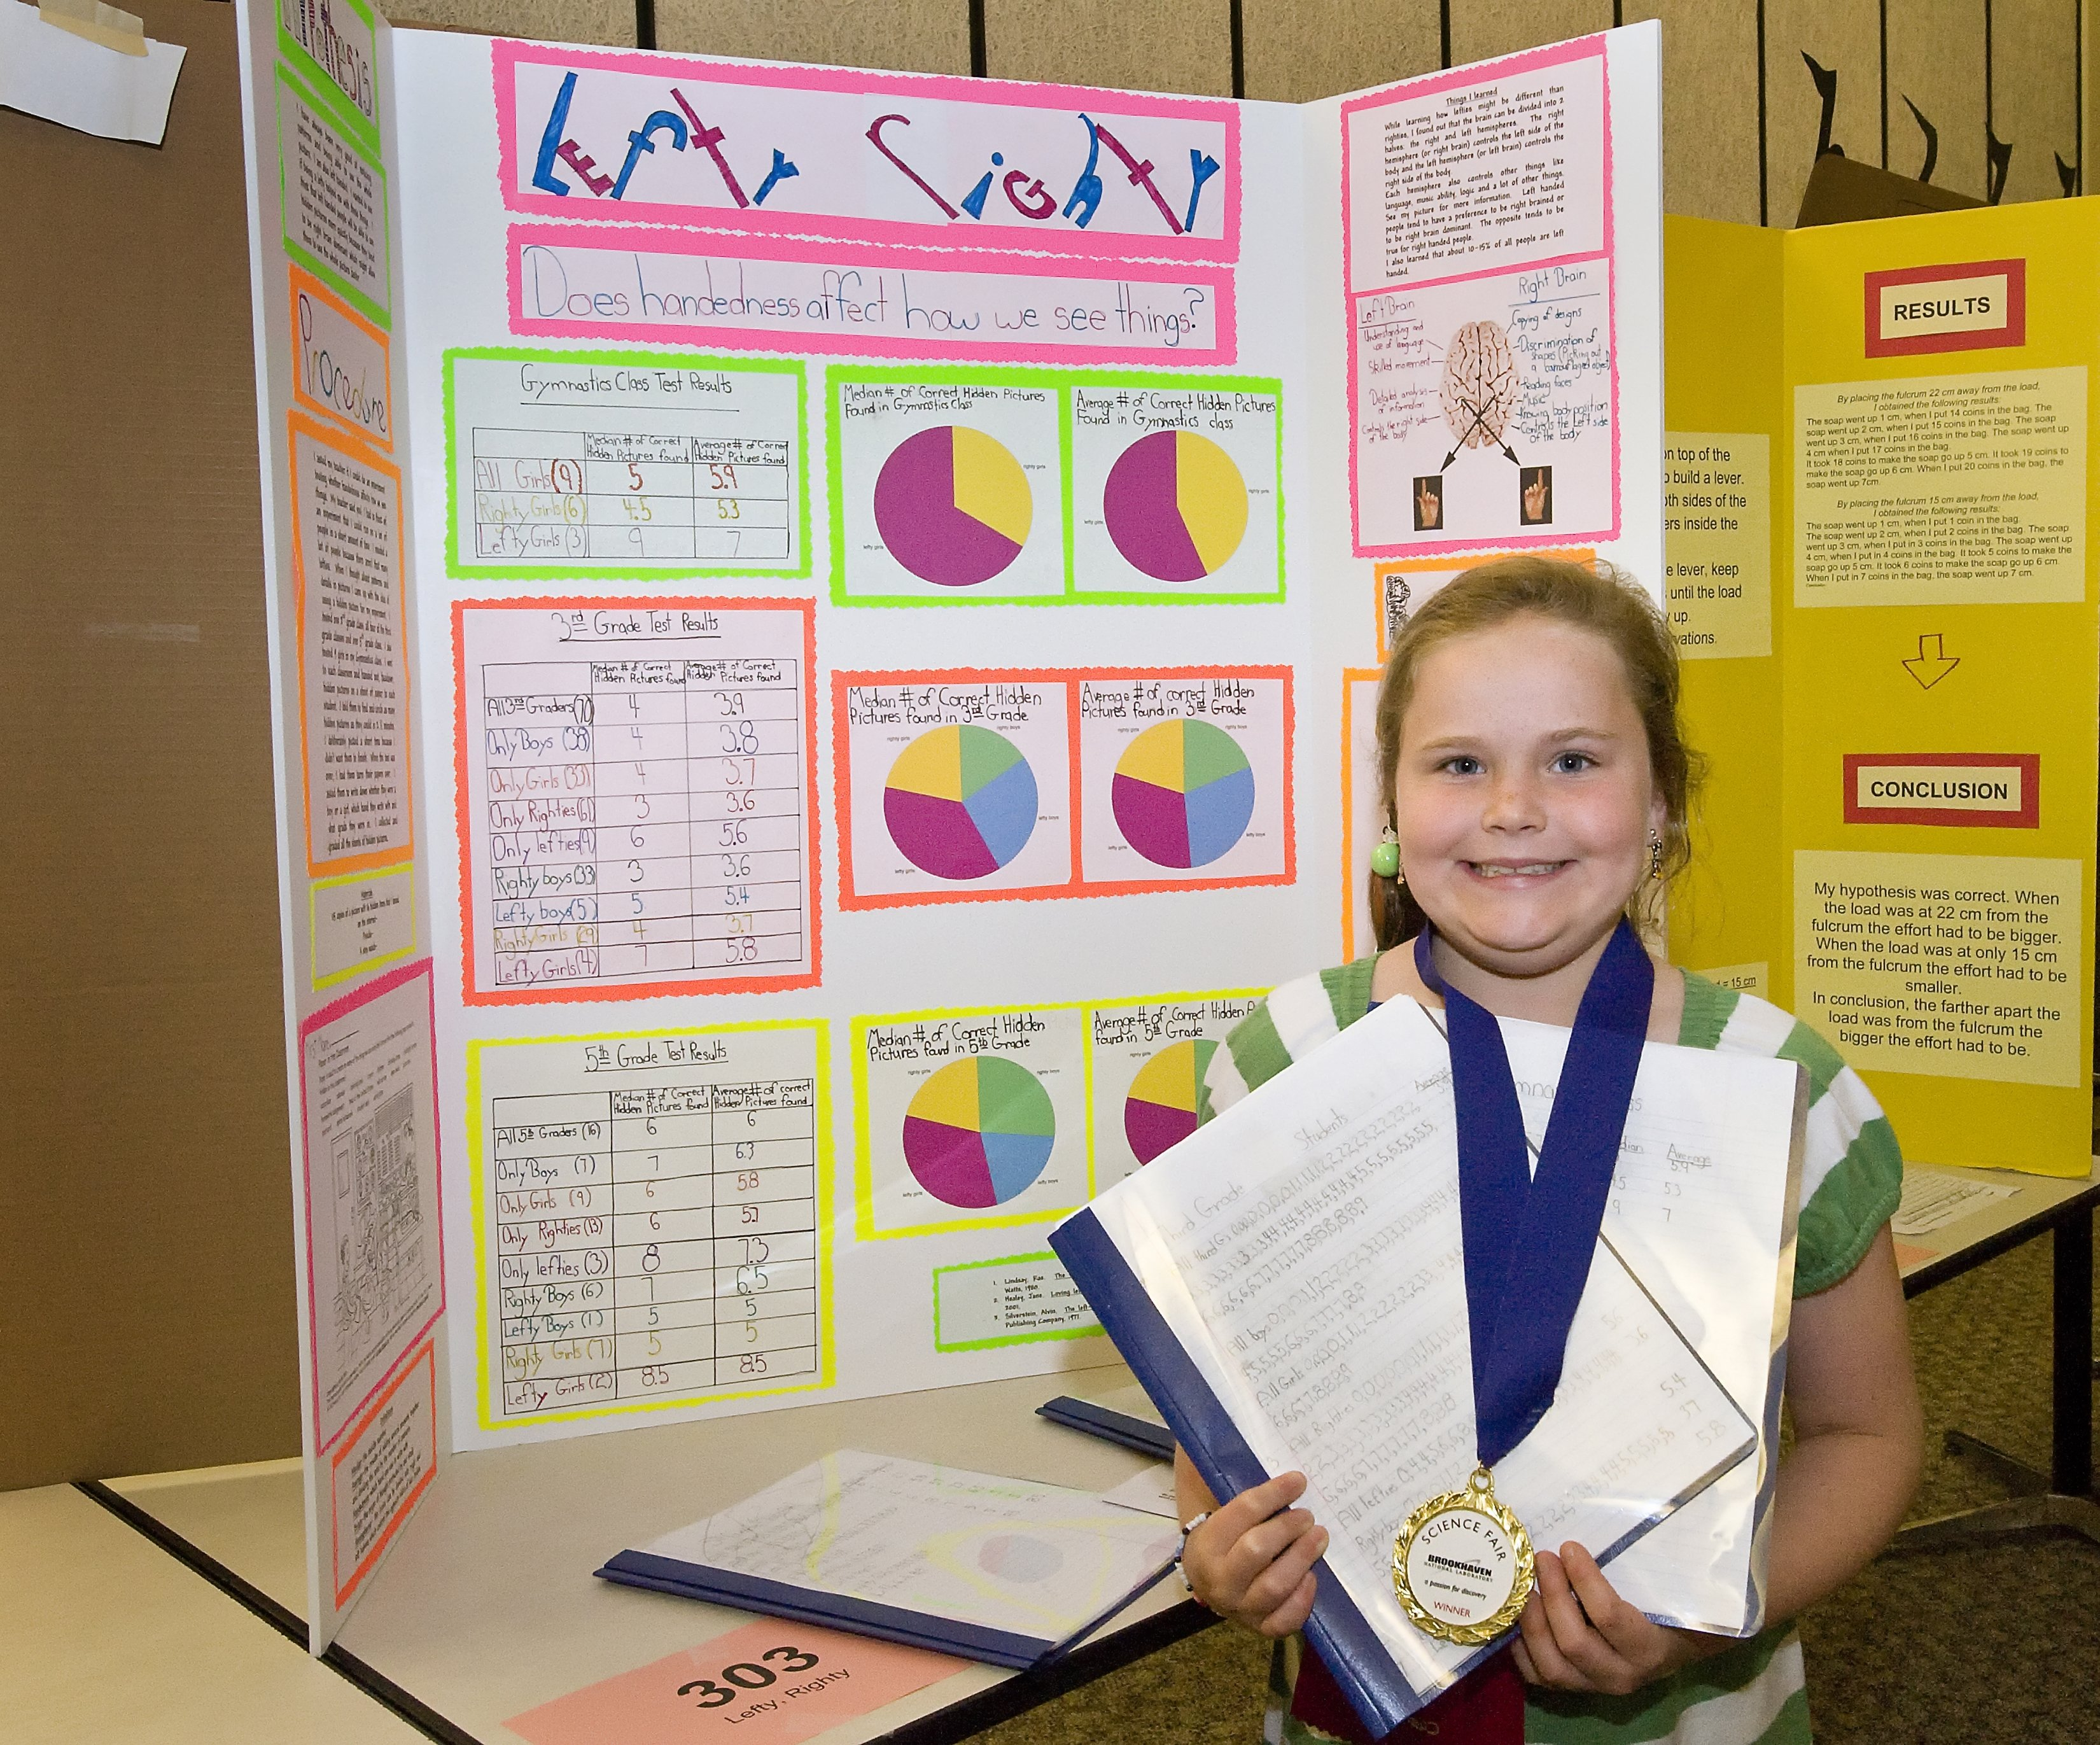 10 Stunning 2Nd Grade Science Fair Ideas second grade science fair project ideas homeshealth 20 2020